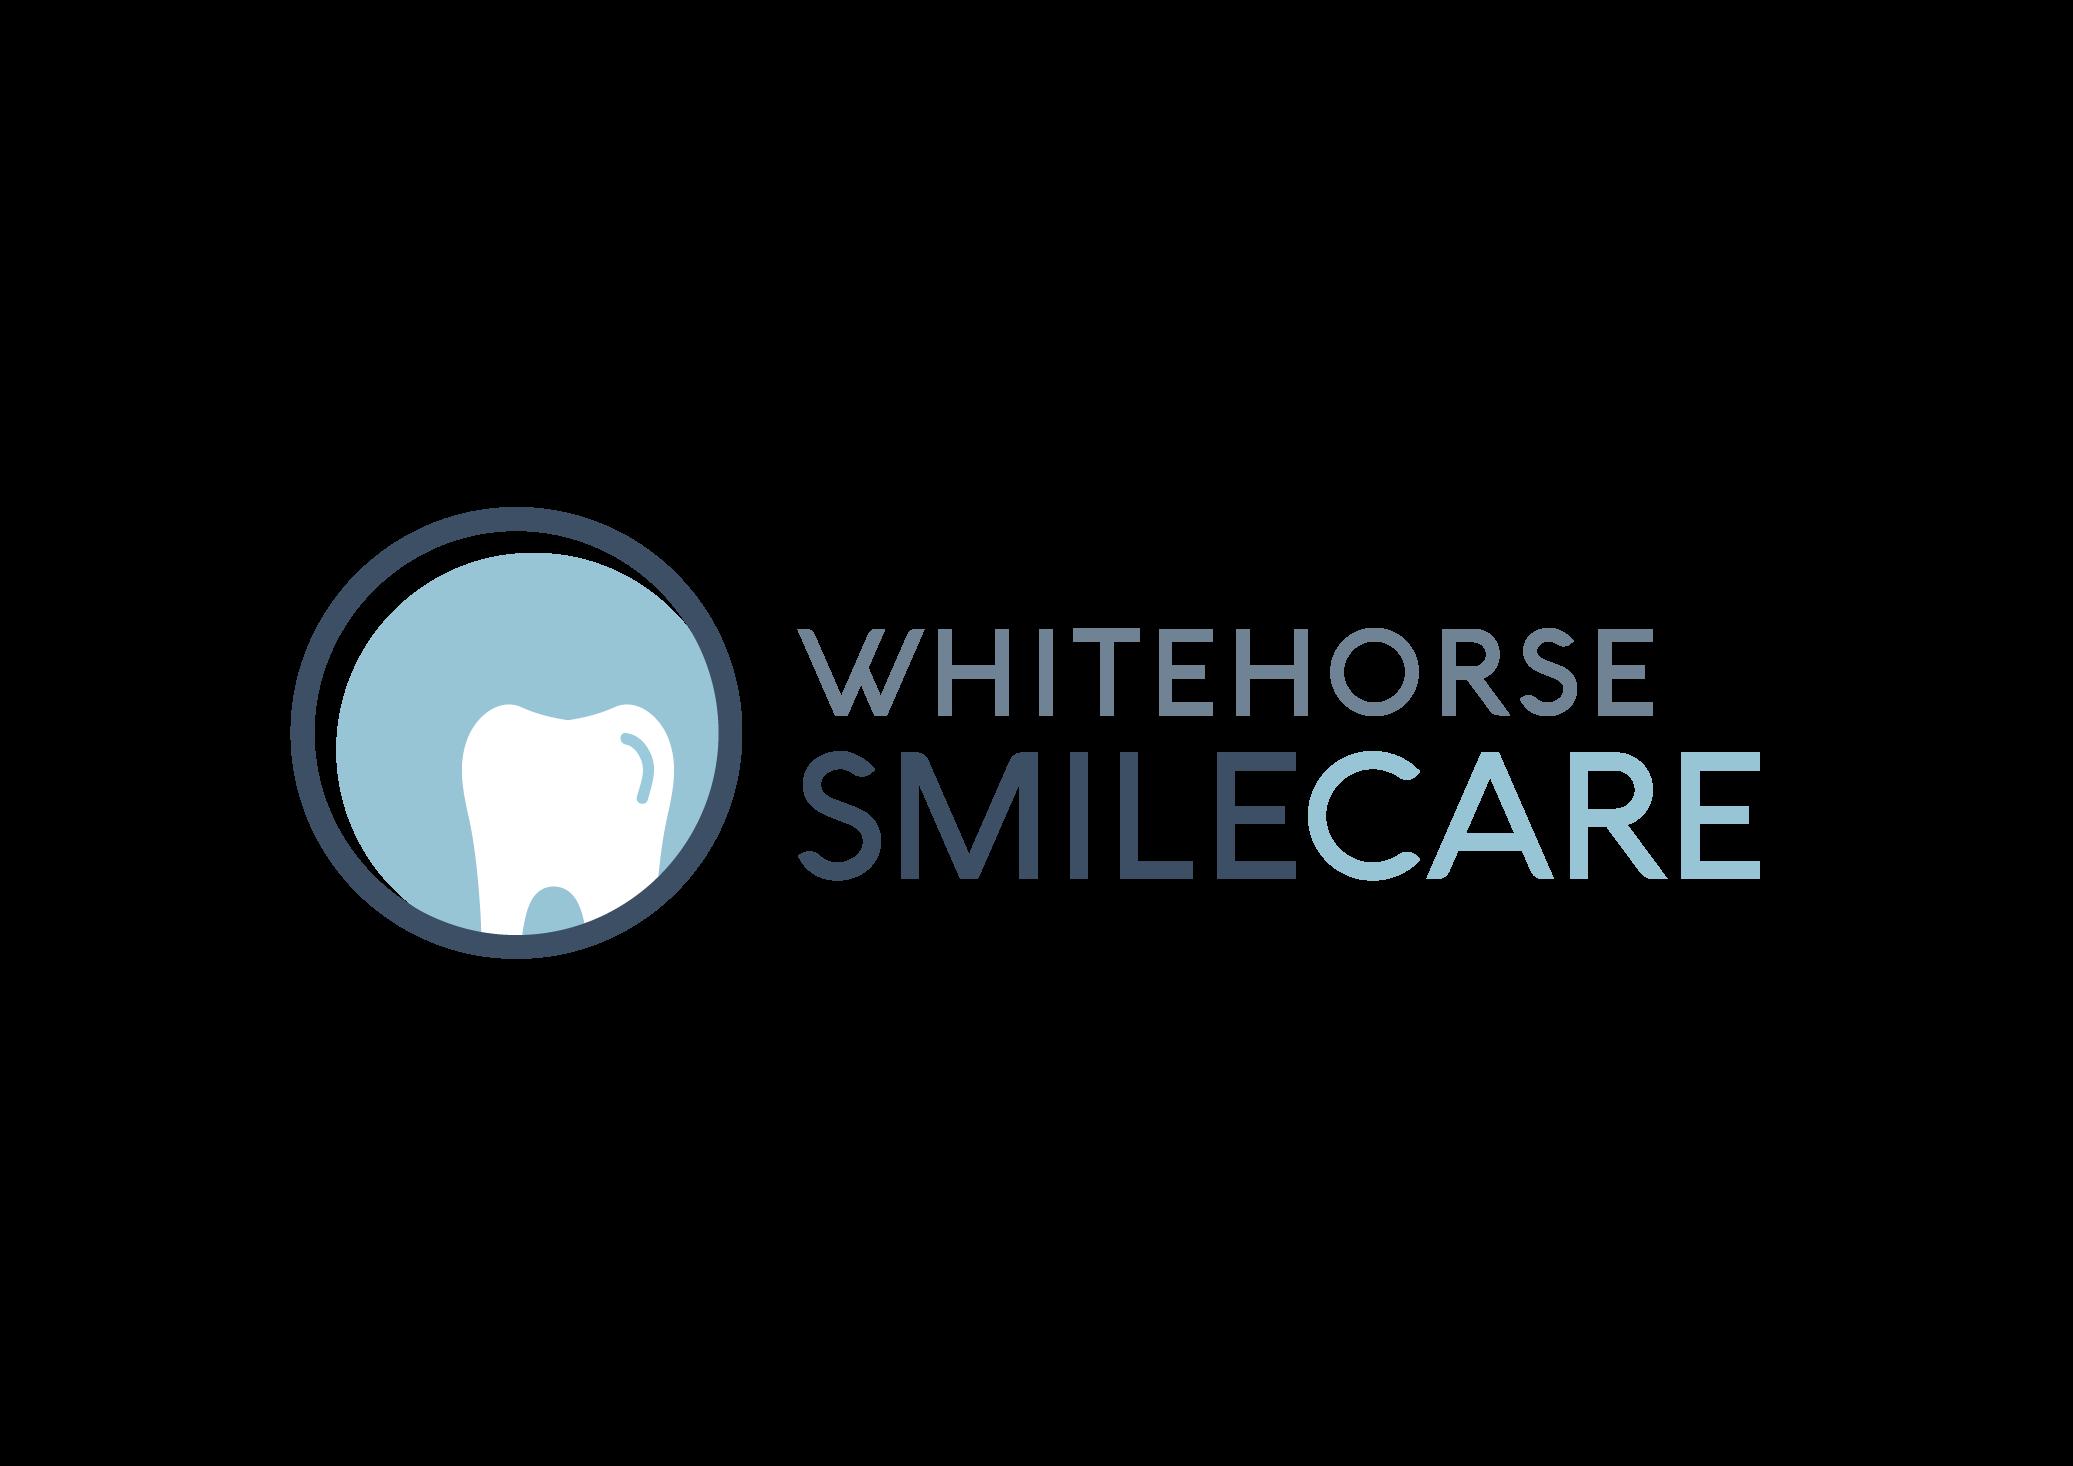 logo for Whitehorse Smile Care Dentists